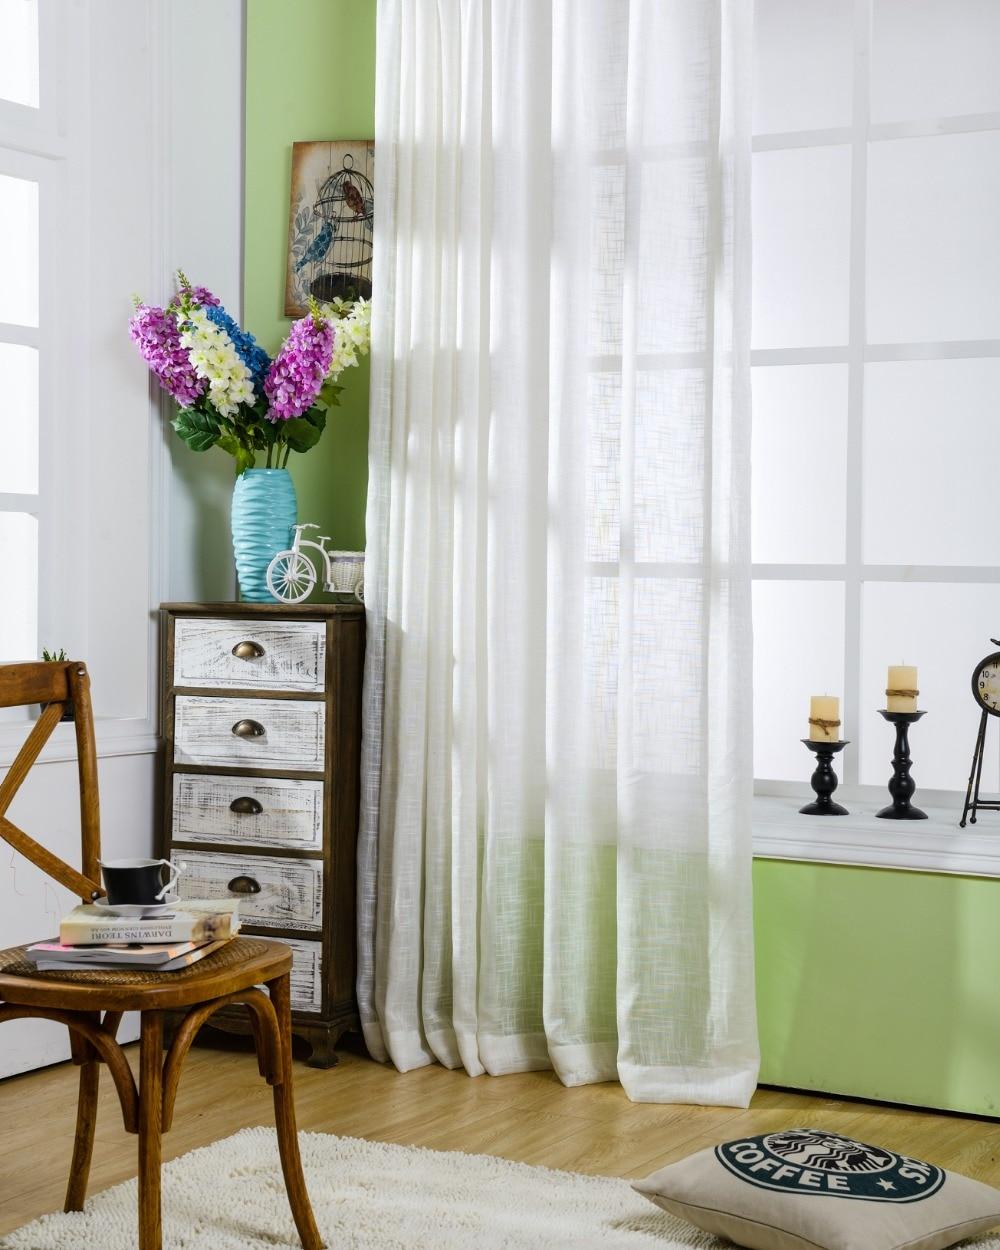 rideau salon design moderne blue style jute salon rideau with rideau salon design design. Black Bedroom Furniture Sets. Home Design Ideas